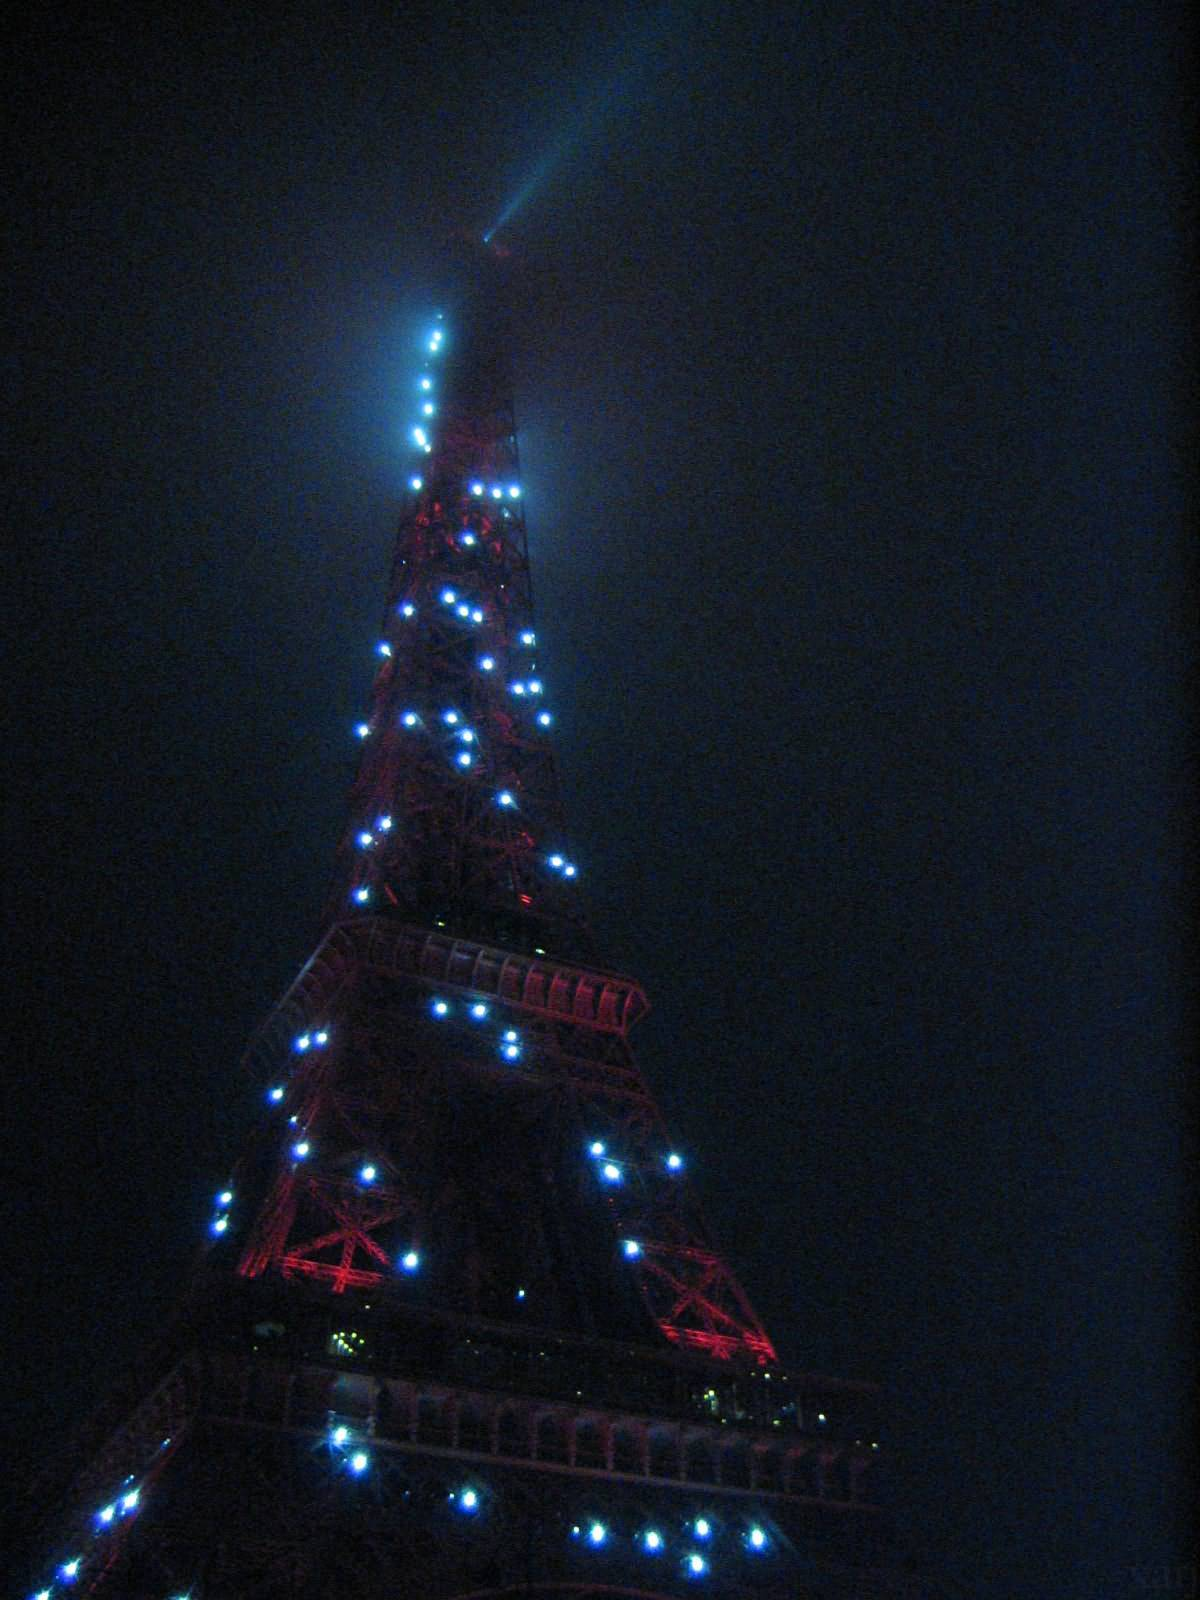 Tour Eiffel Blue Lights